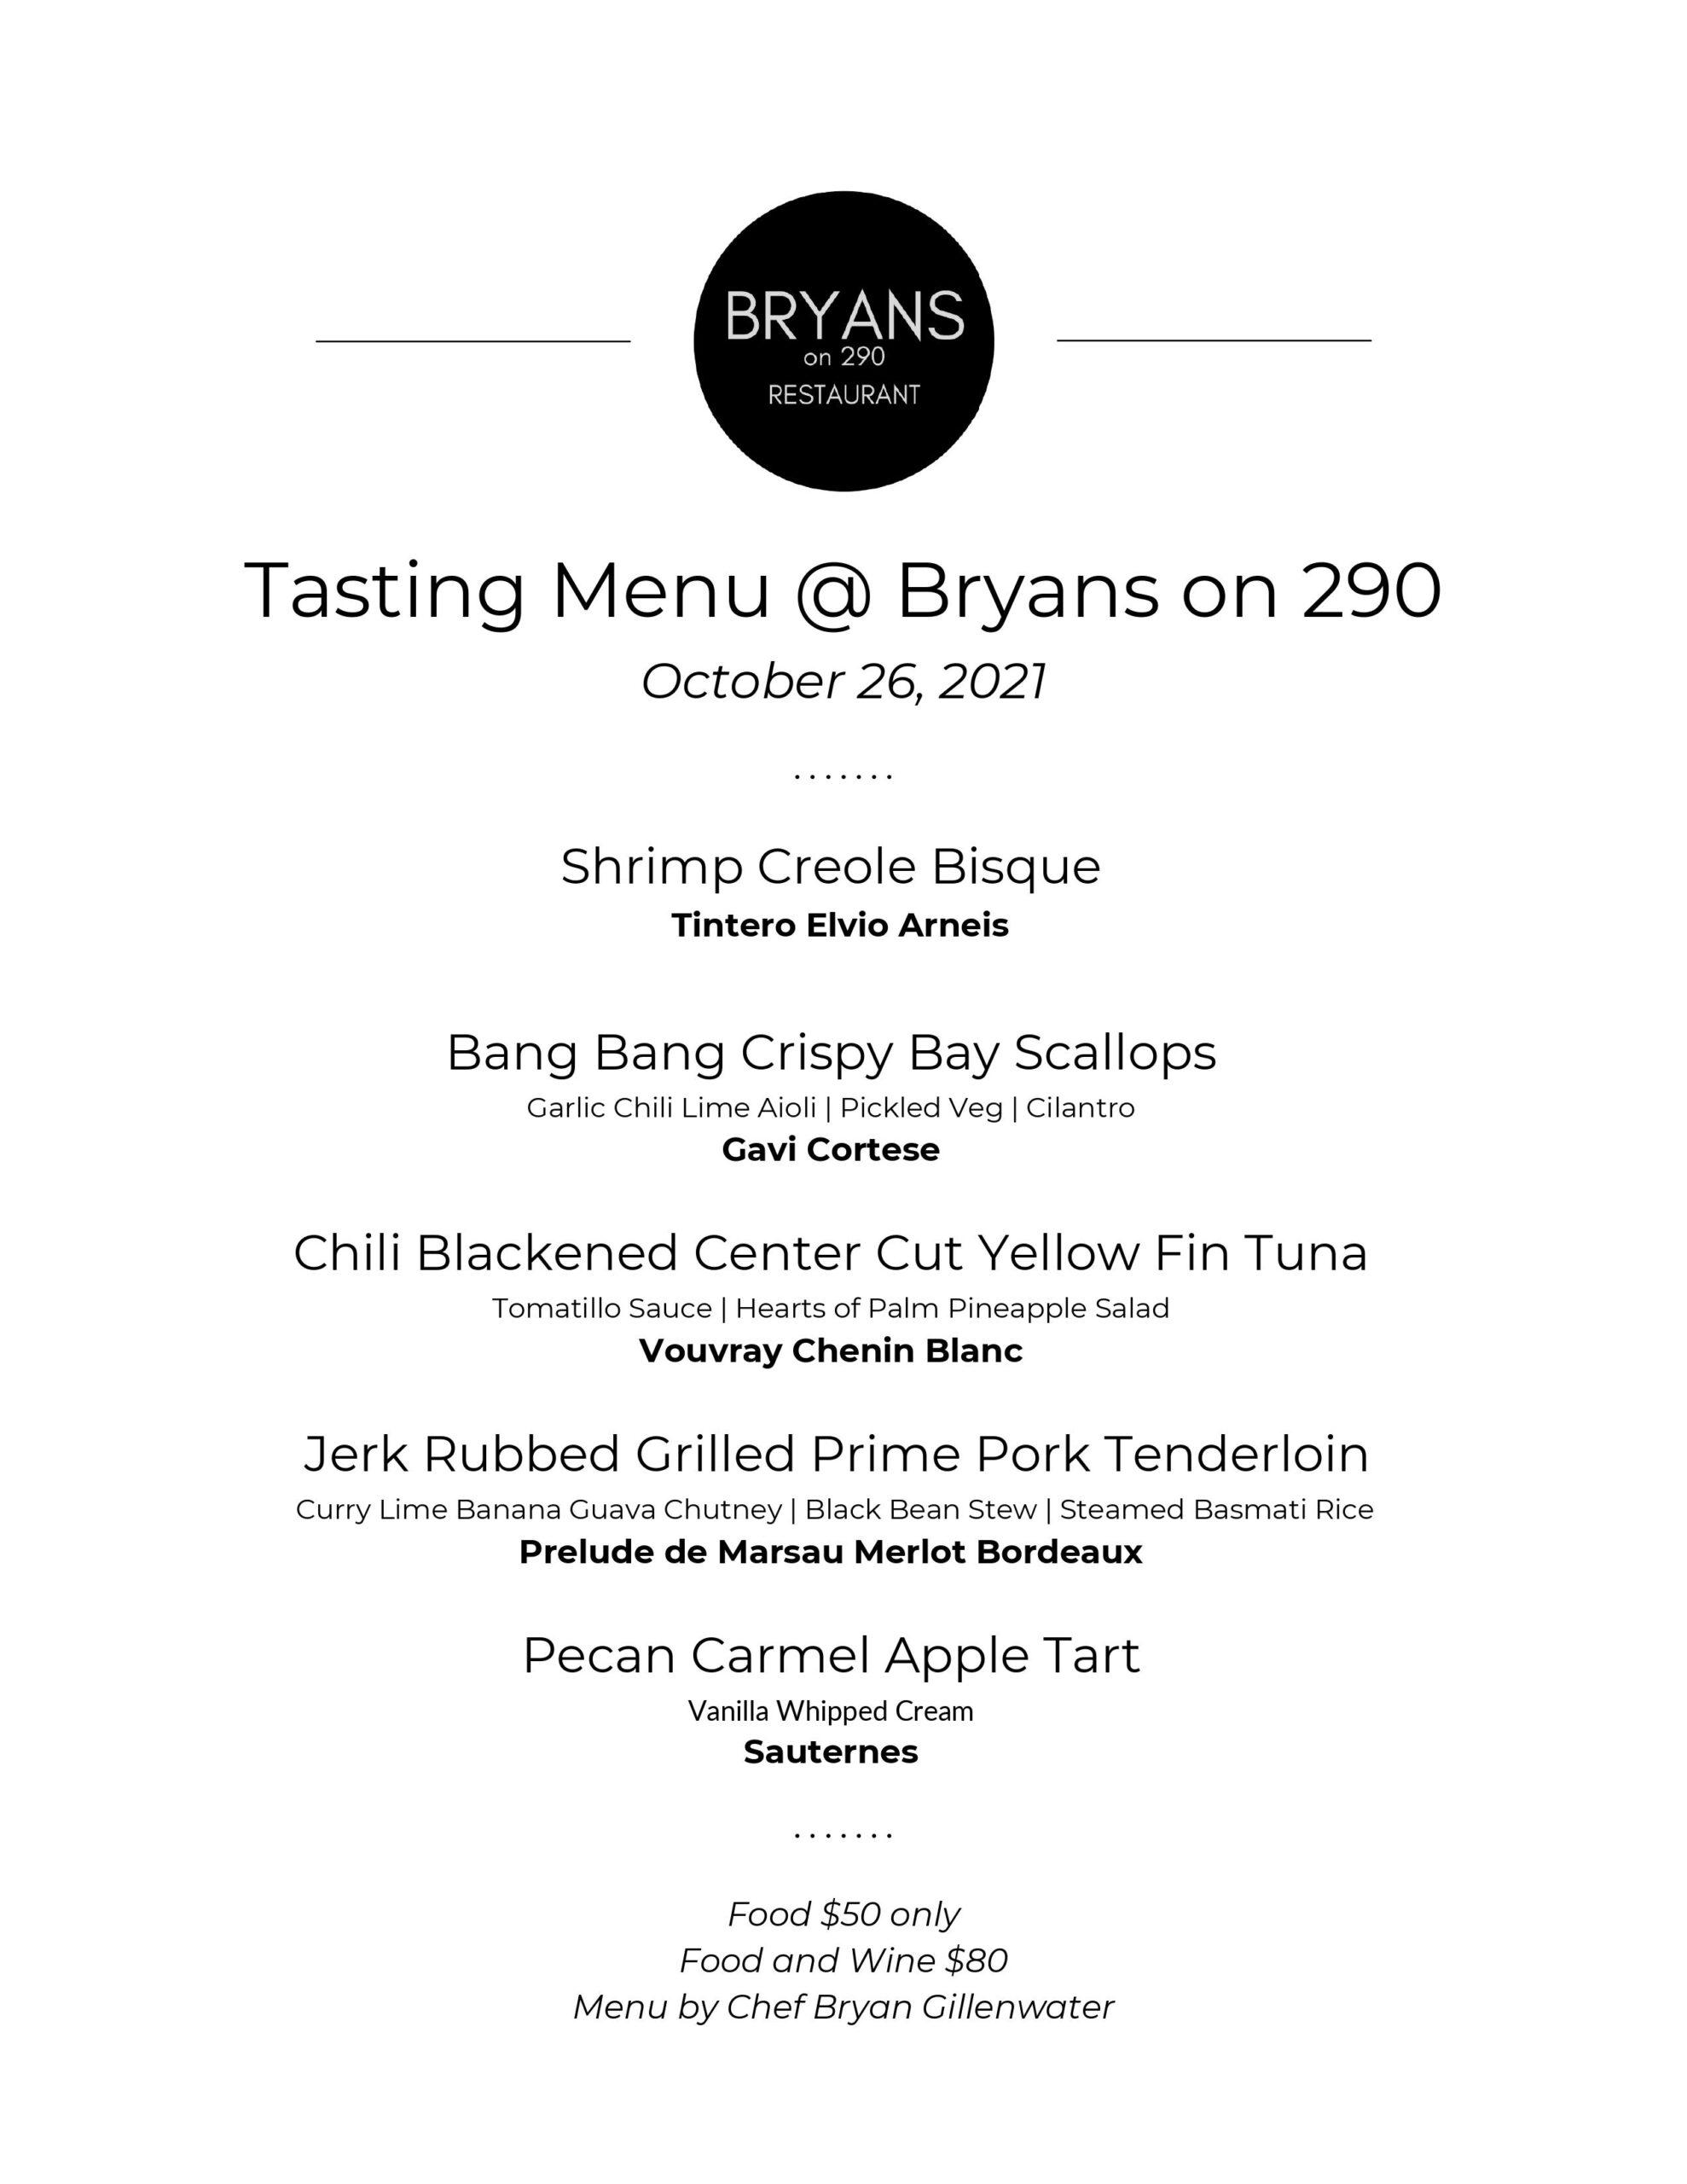 Bryans on 290 - Tuesday Menu 8-17-2021